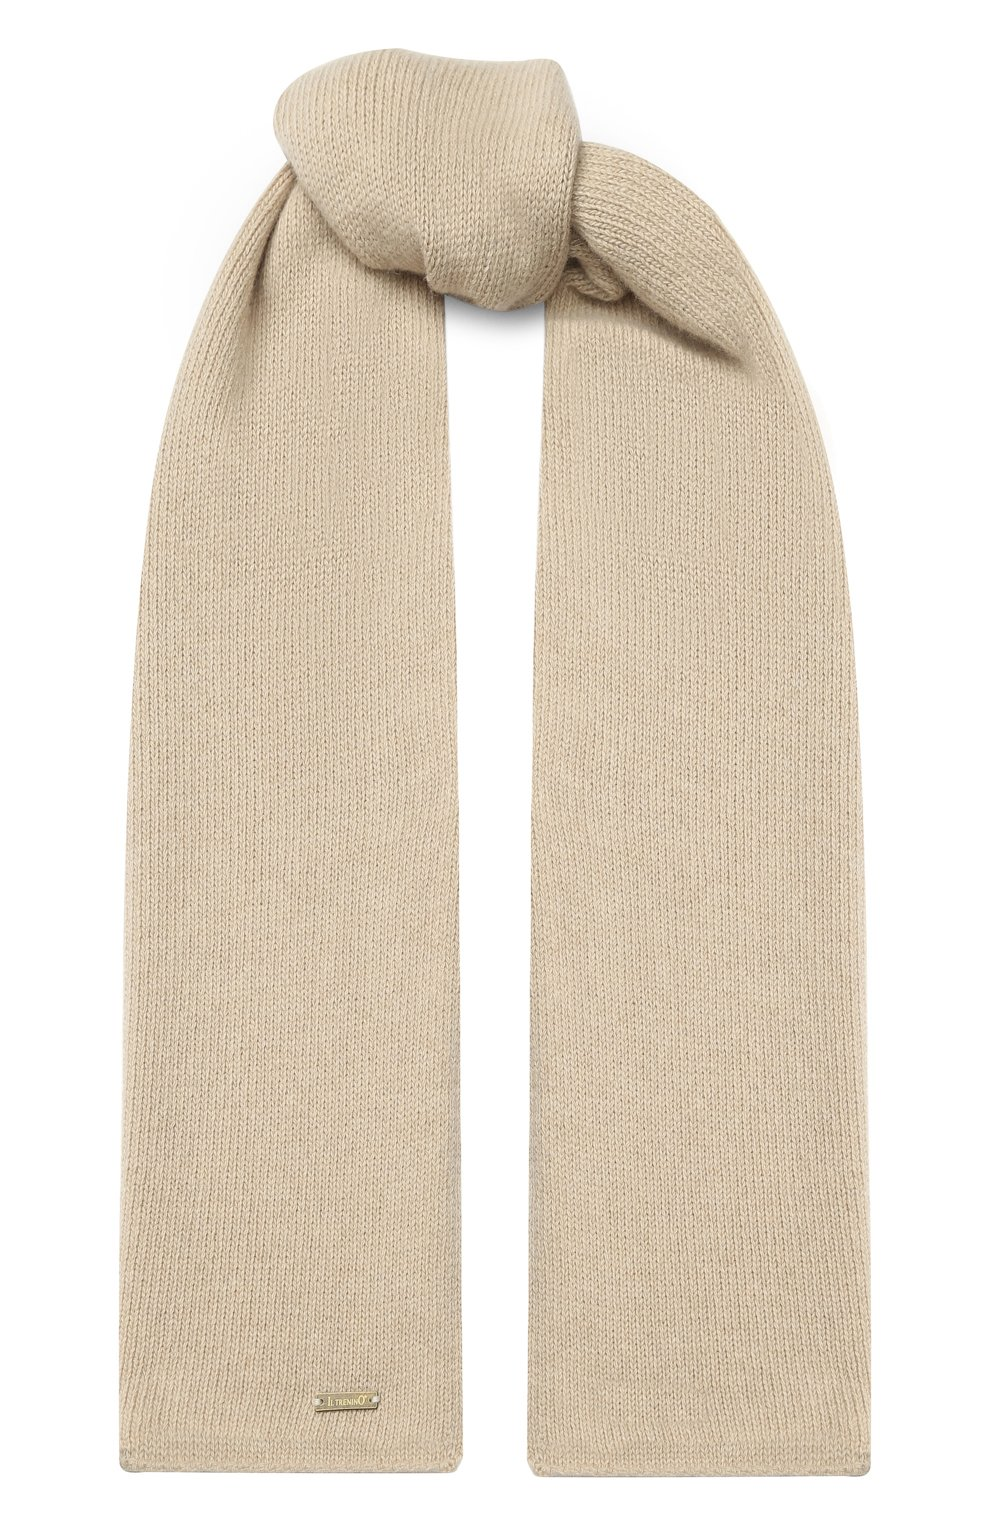 Детский шарф из шерсти и кашемира IL TRENINO бежевого цвета, арт. 17 5150/E0 | Фото 1